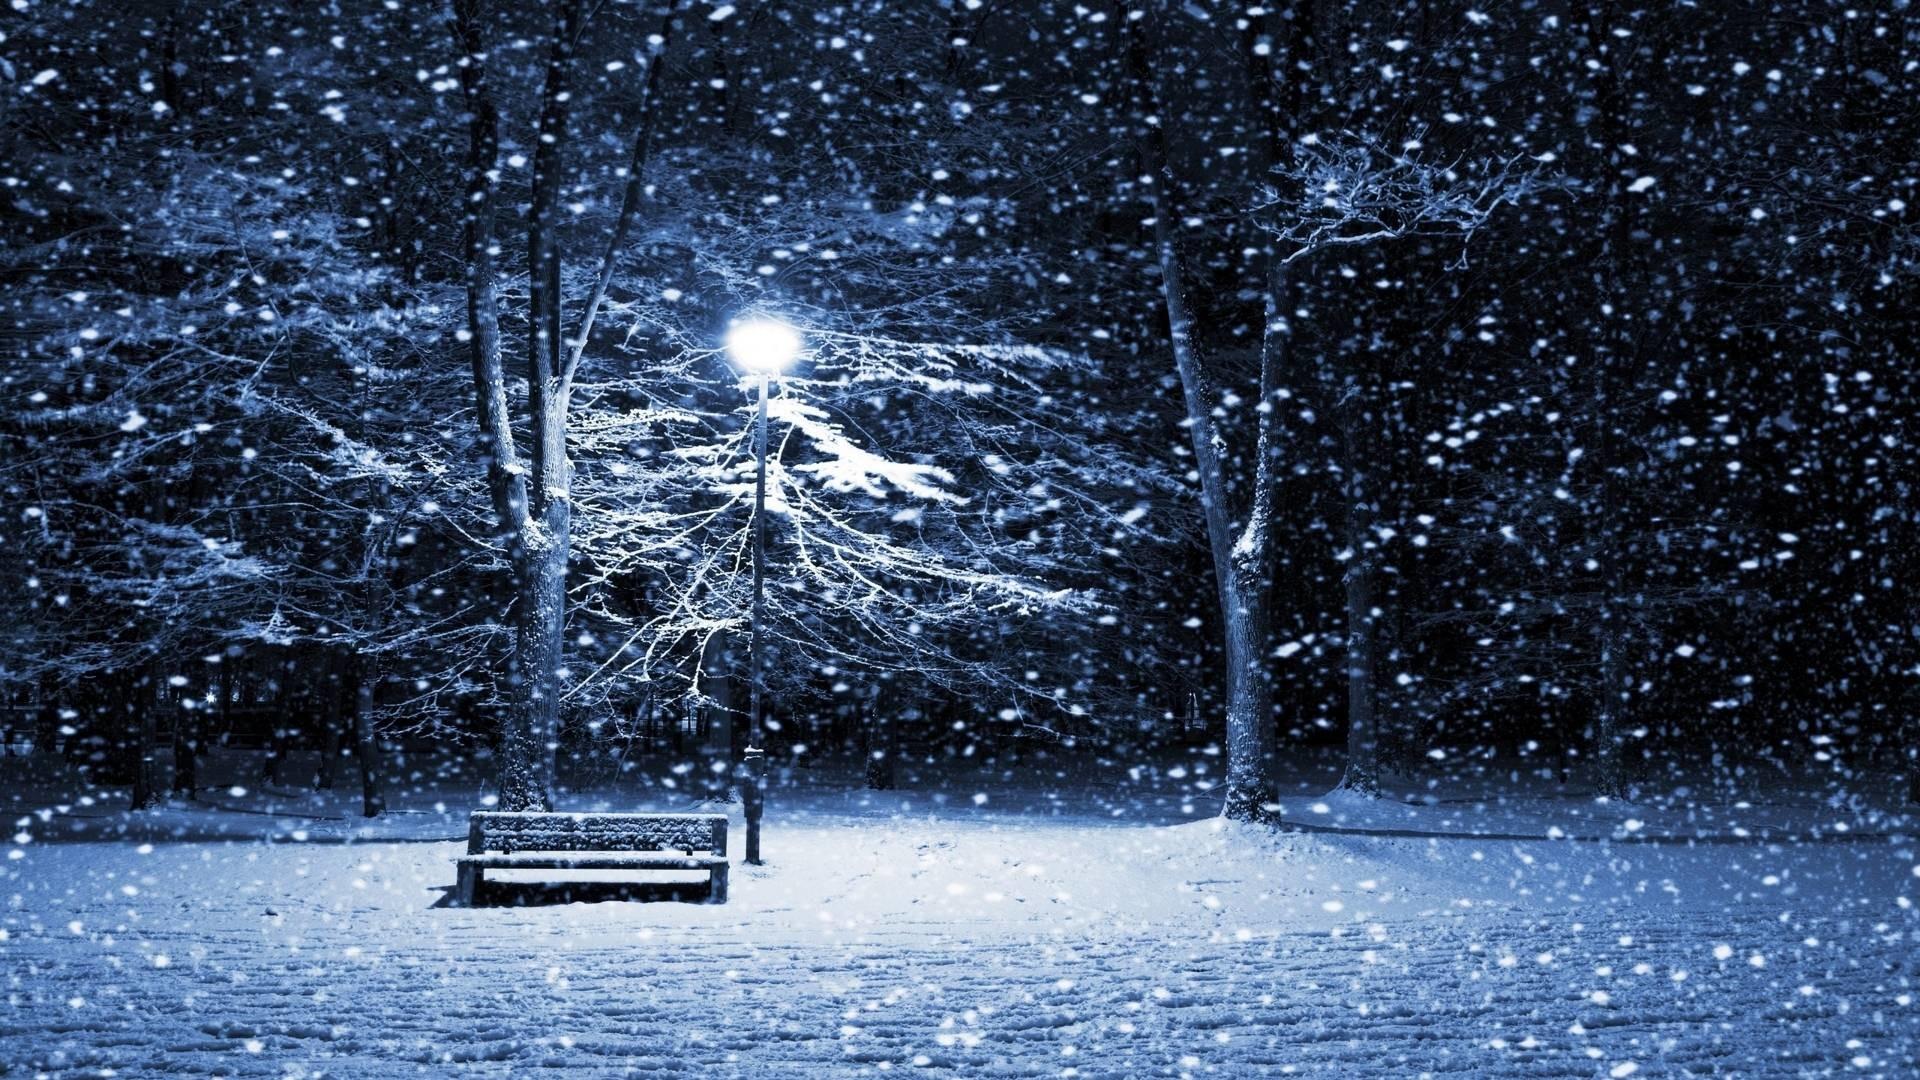 Winter Snow Scene Photography (id: 41878) | WallPho.com